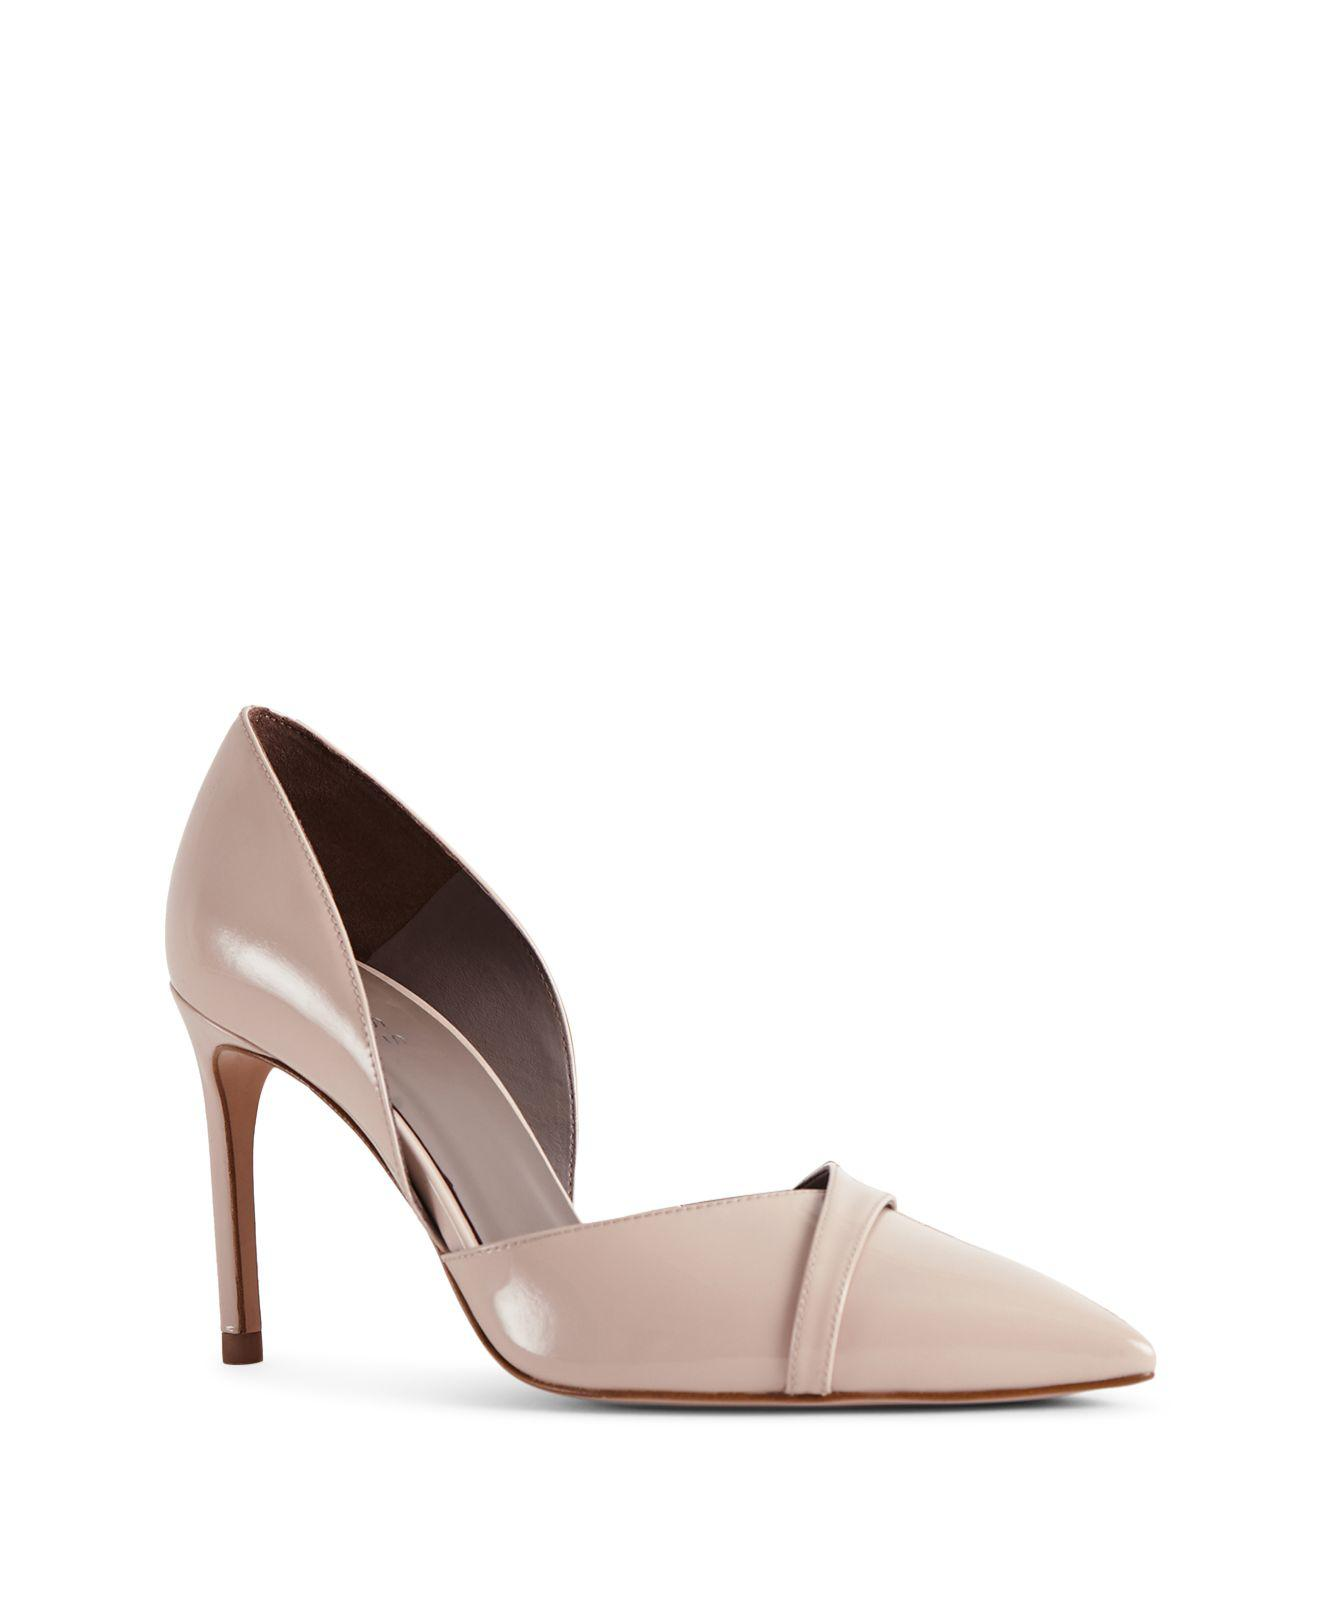 Reiss Women's Georgia Patent Leather Crossover High Heel Pumps EcAifpRE